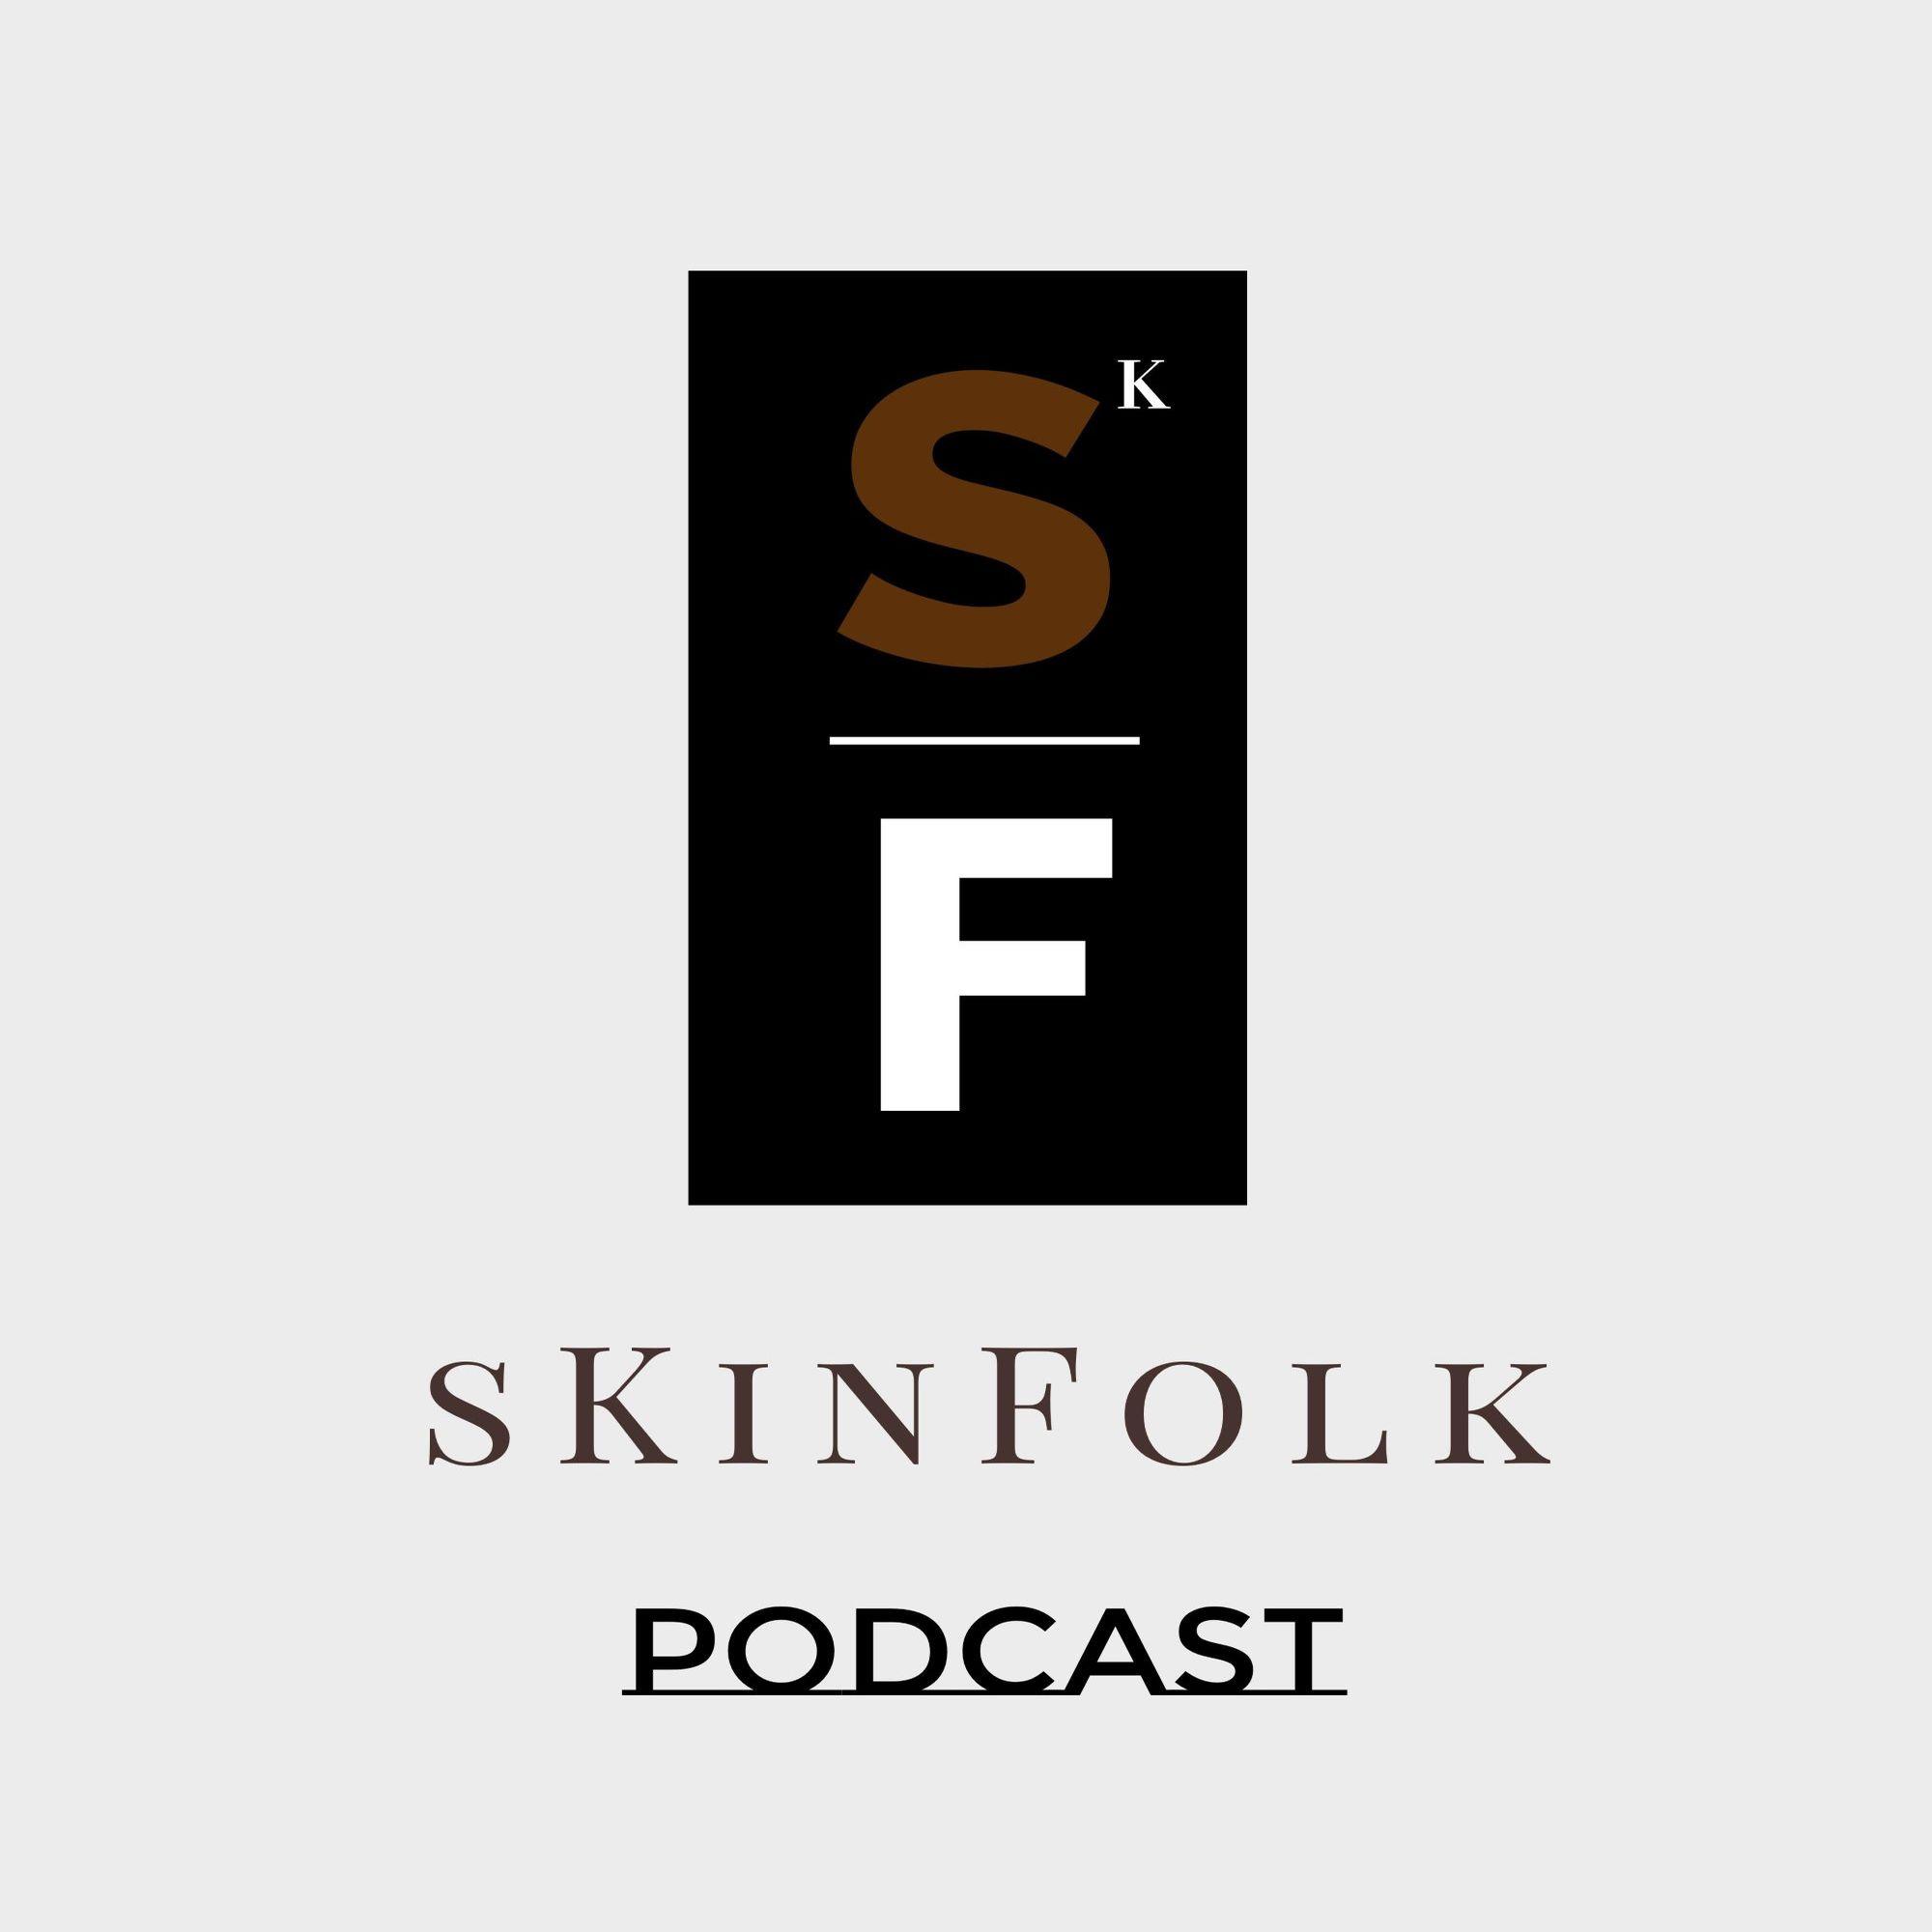 SKinFolk Podcast